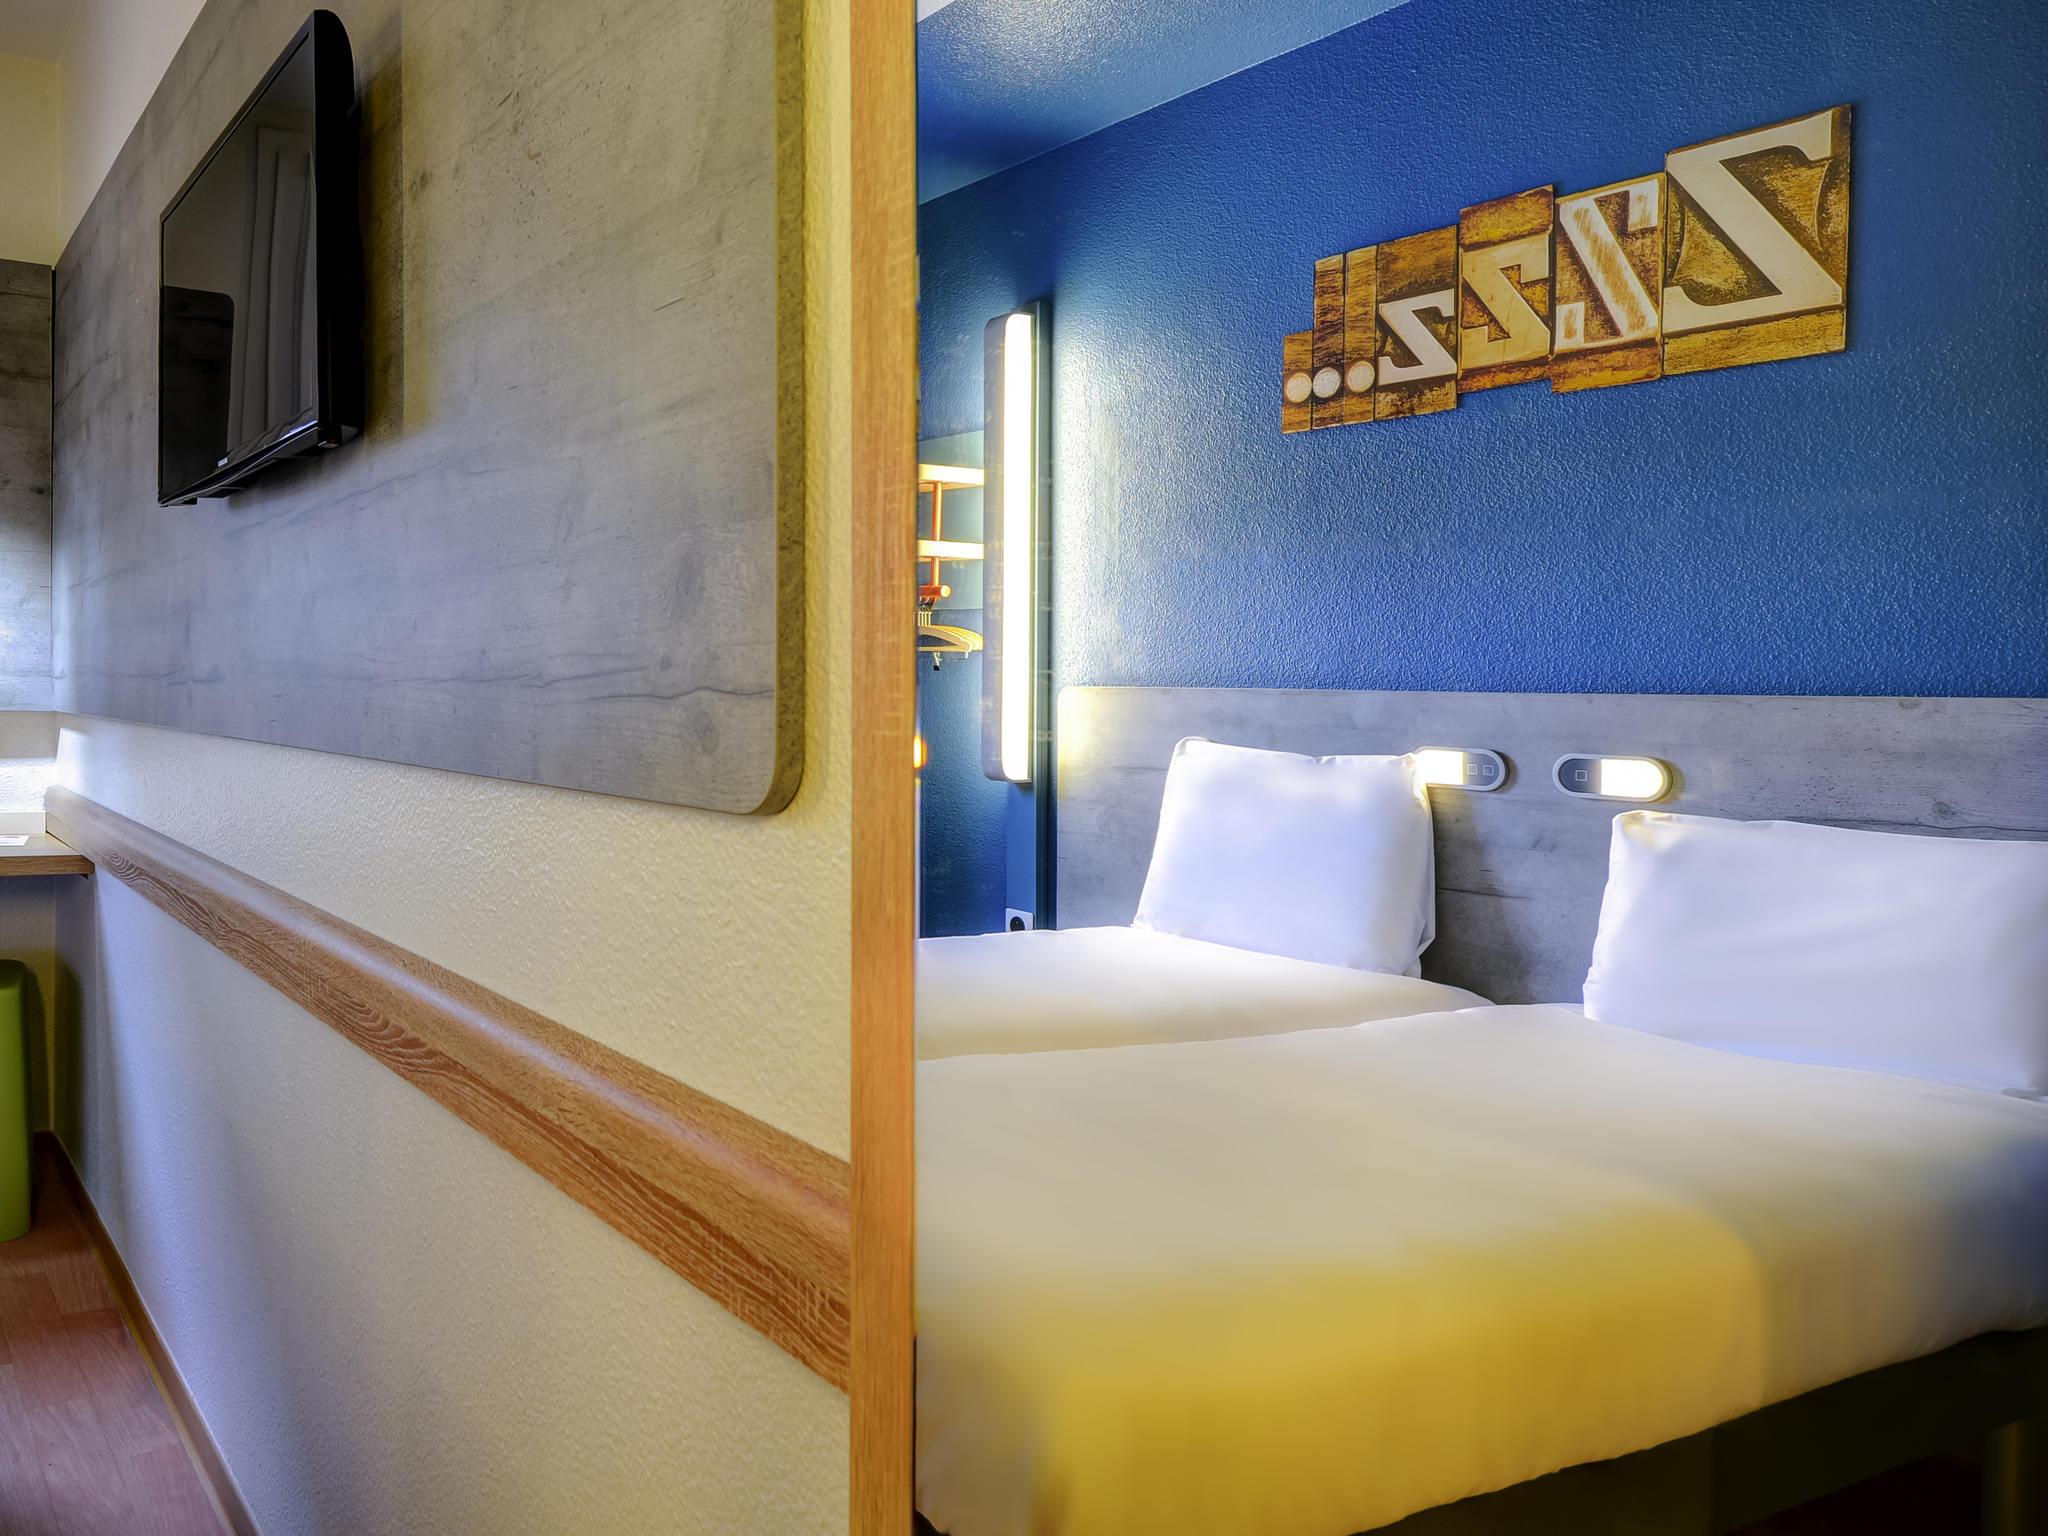 hotel in rueil malmaison ibis budget rueil malmaison. Black Bedroom Furniture Sets. Home Design Ideas